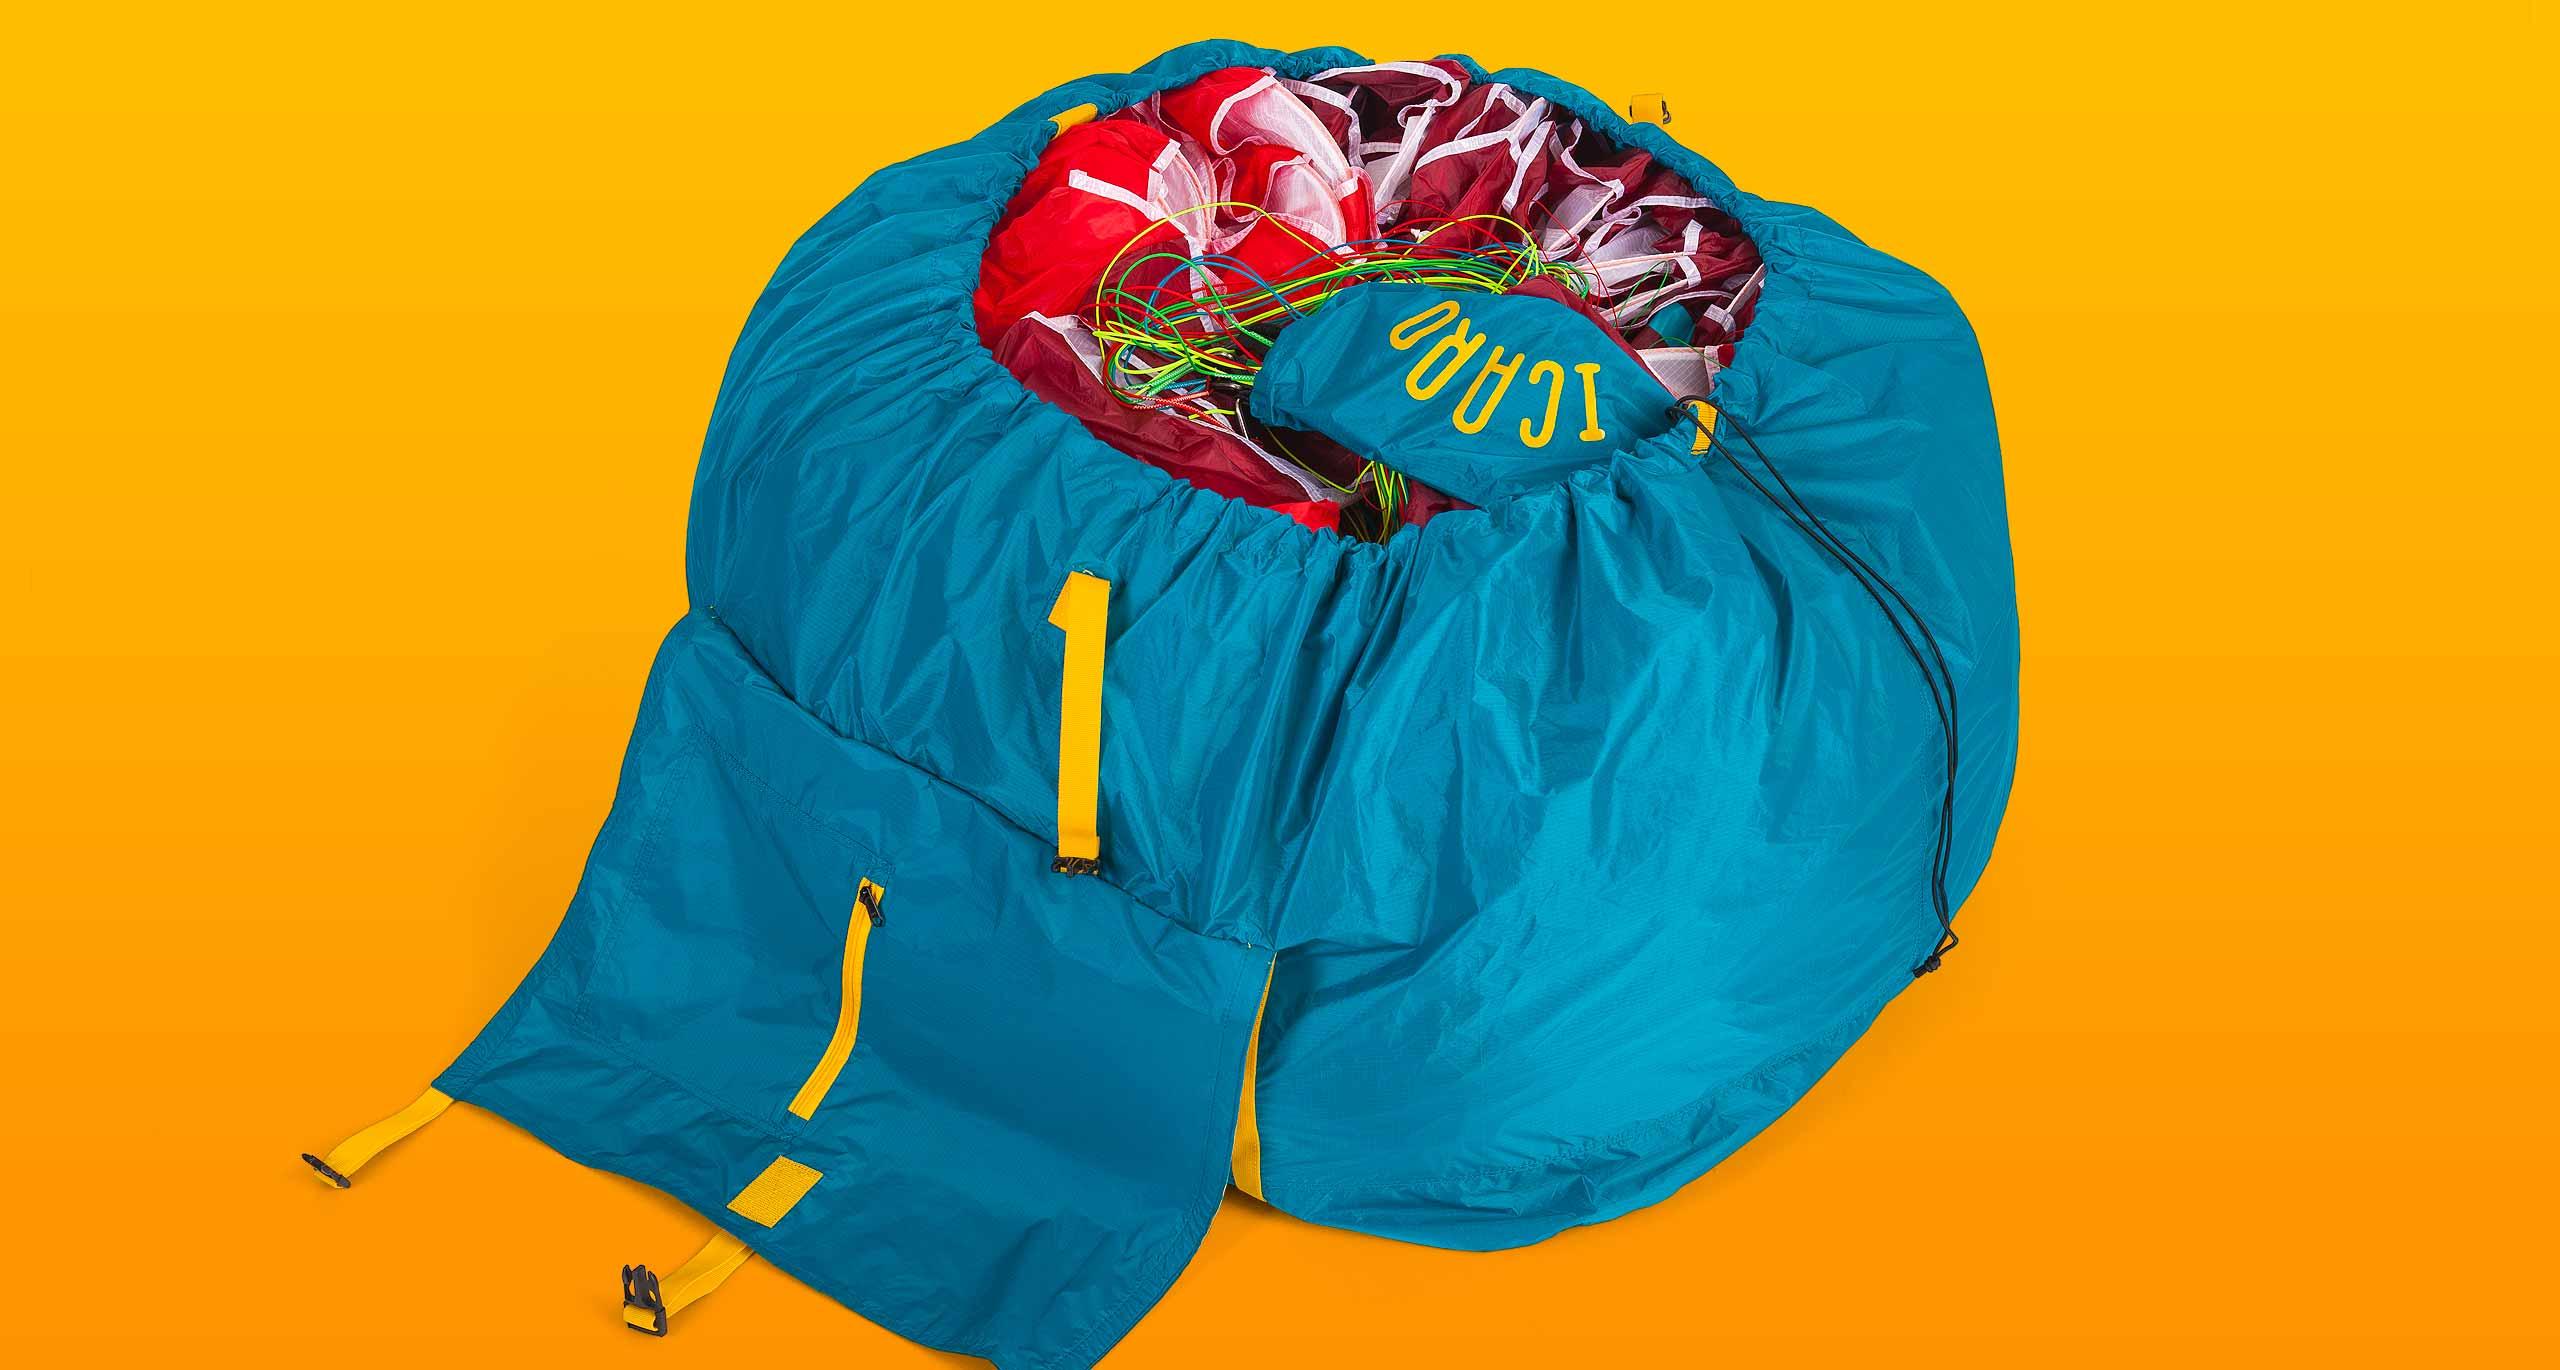 Fast Packing Bag Icaro Paragliders